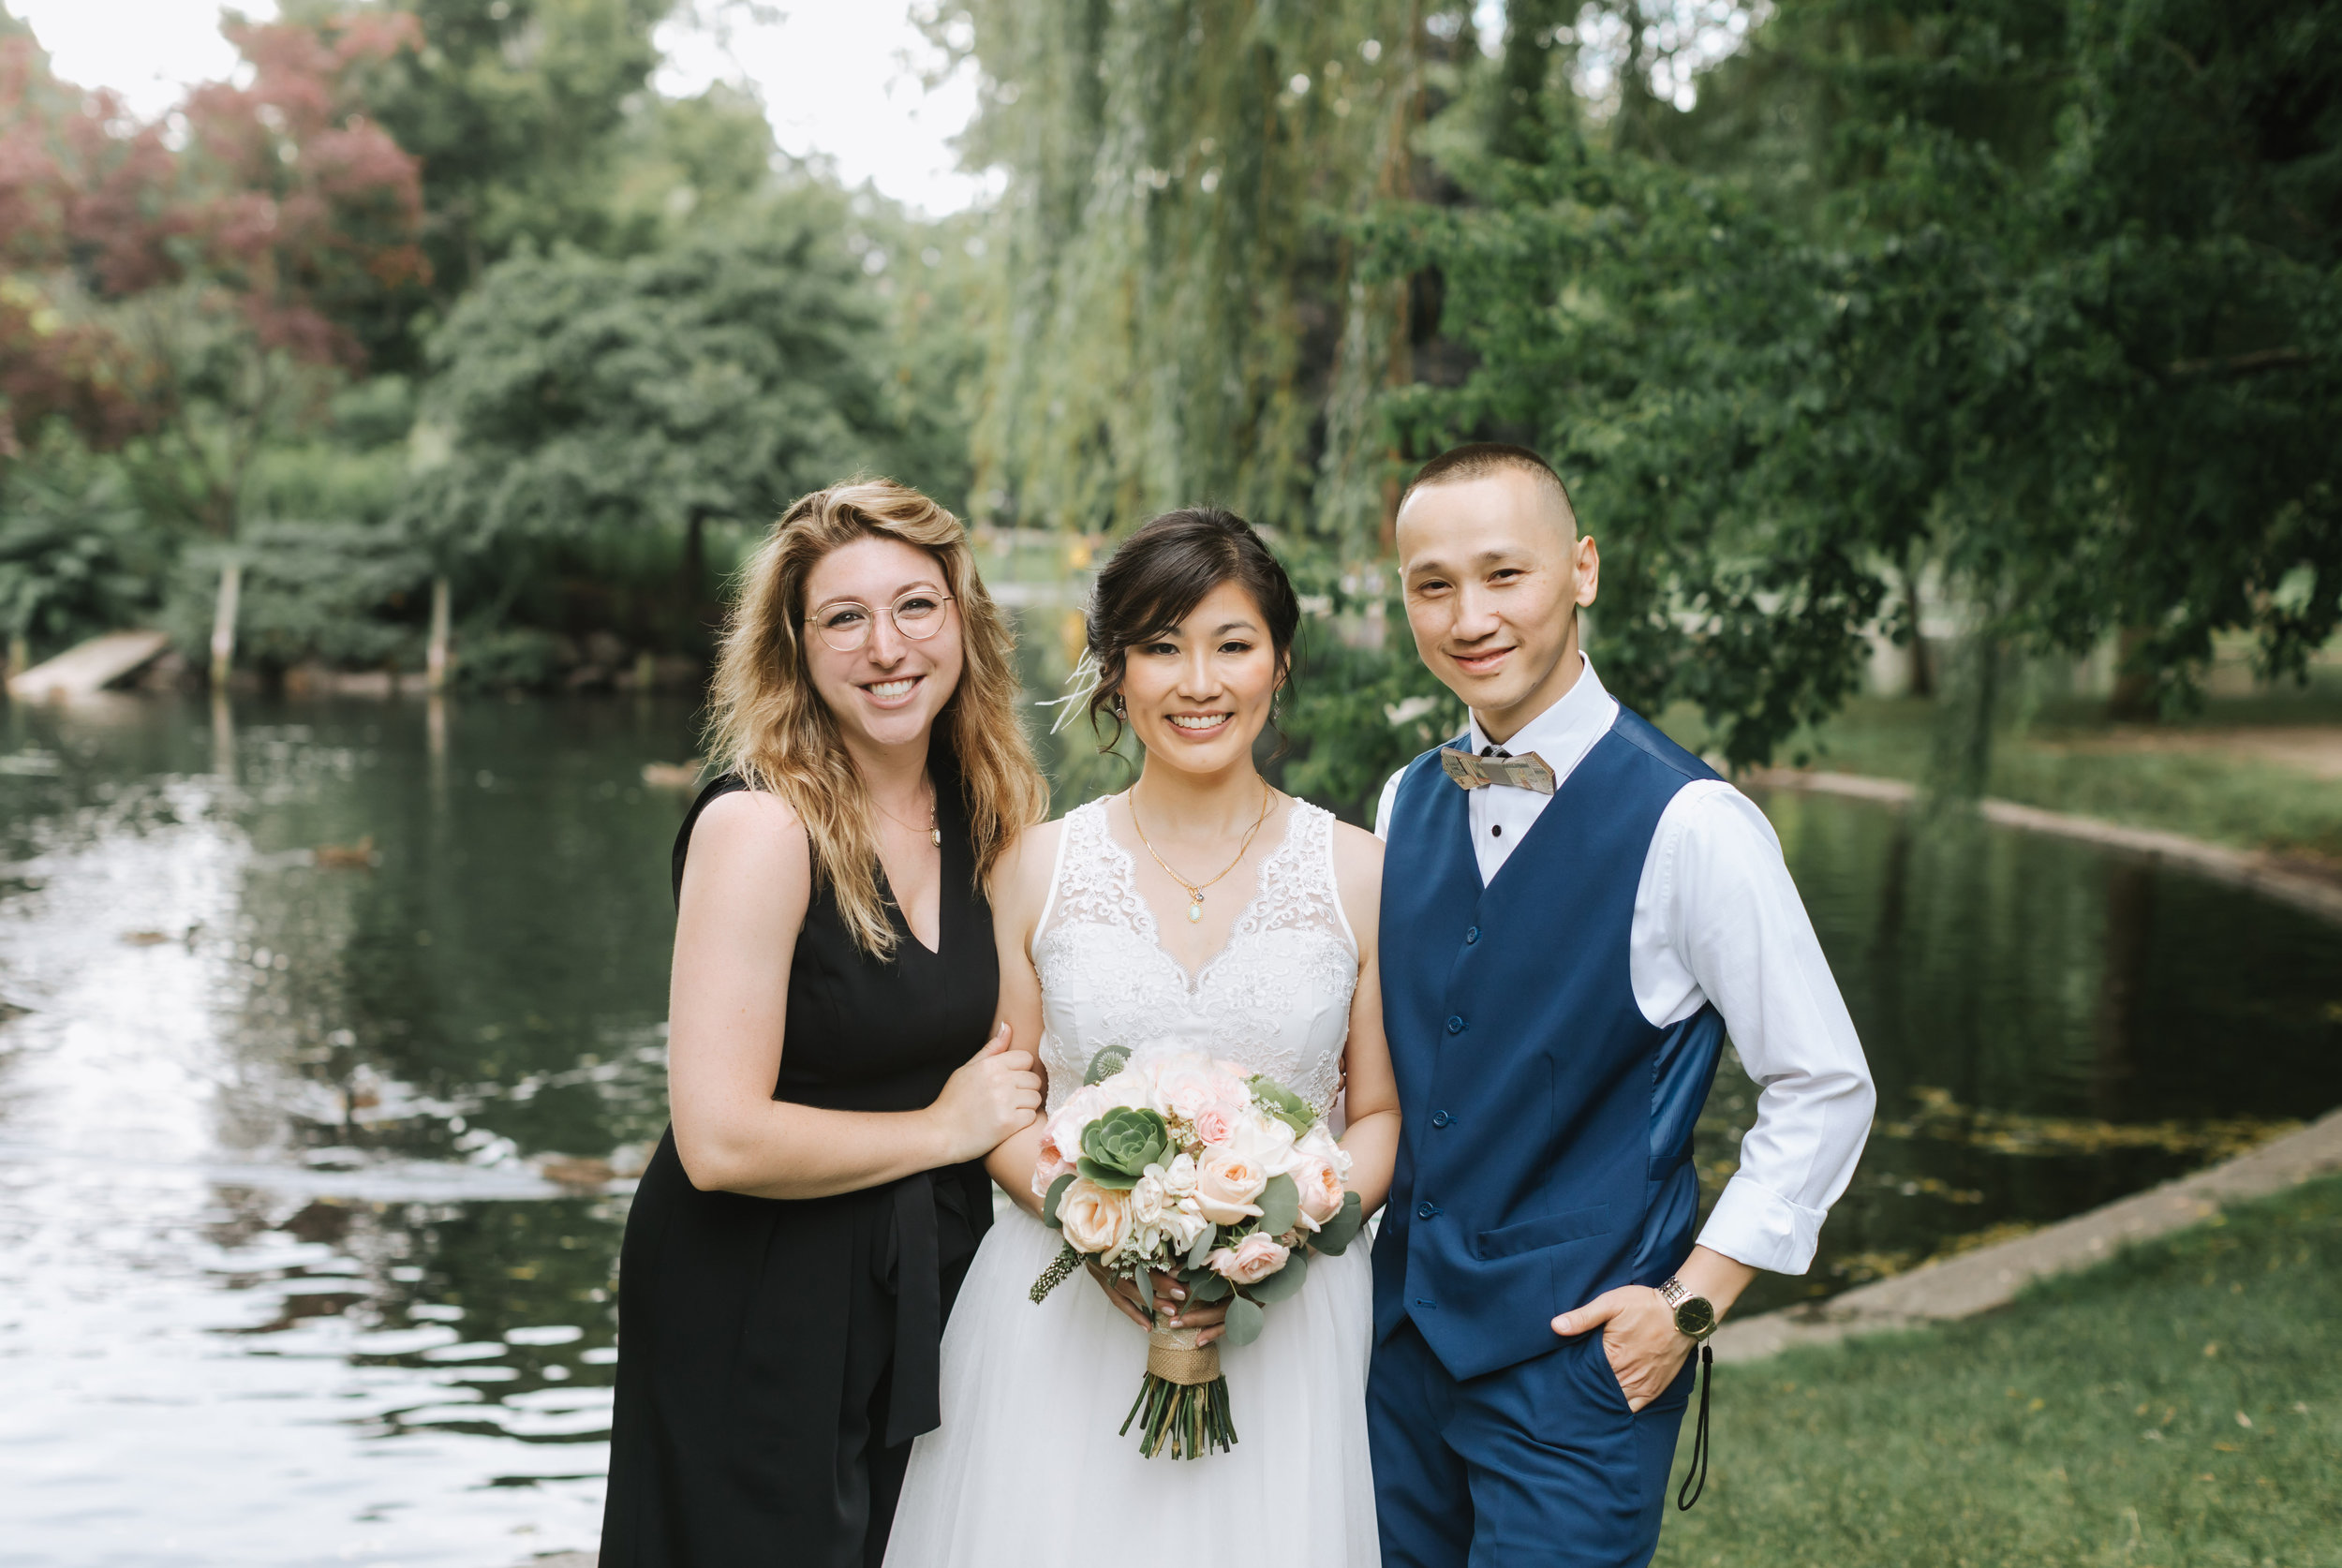 Cathy-Evan-Wedding-236.JPG